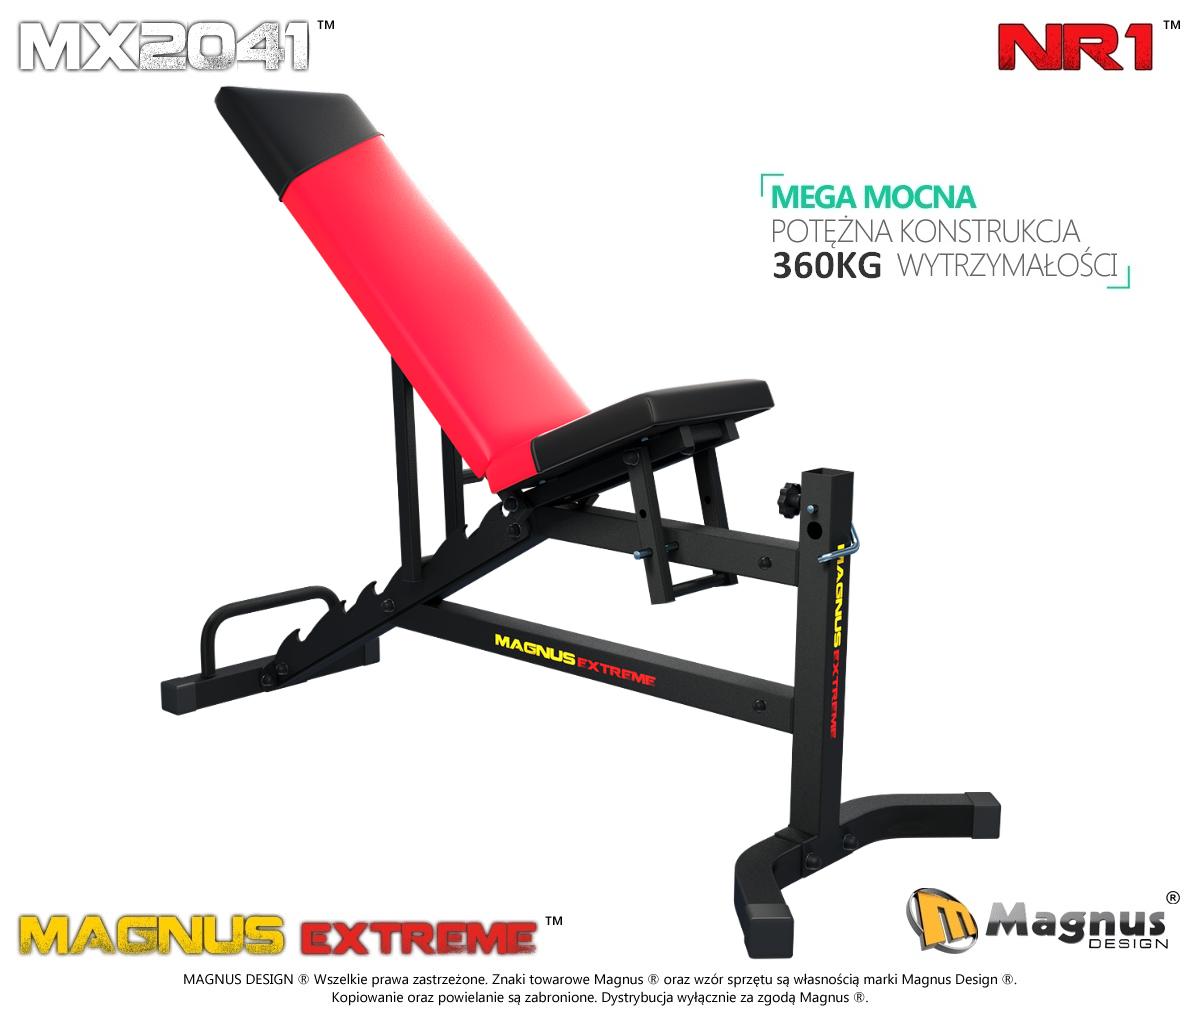 Ławka do ćwiczeń  Magnus MX2041